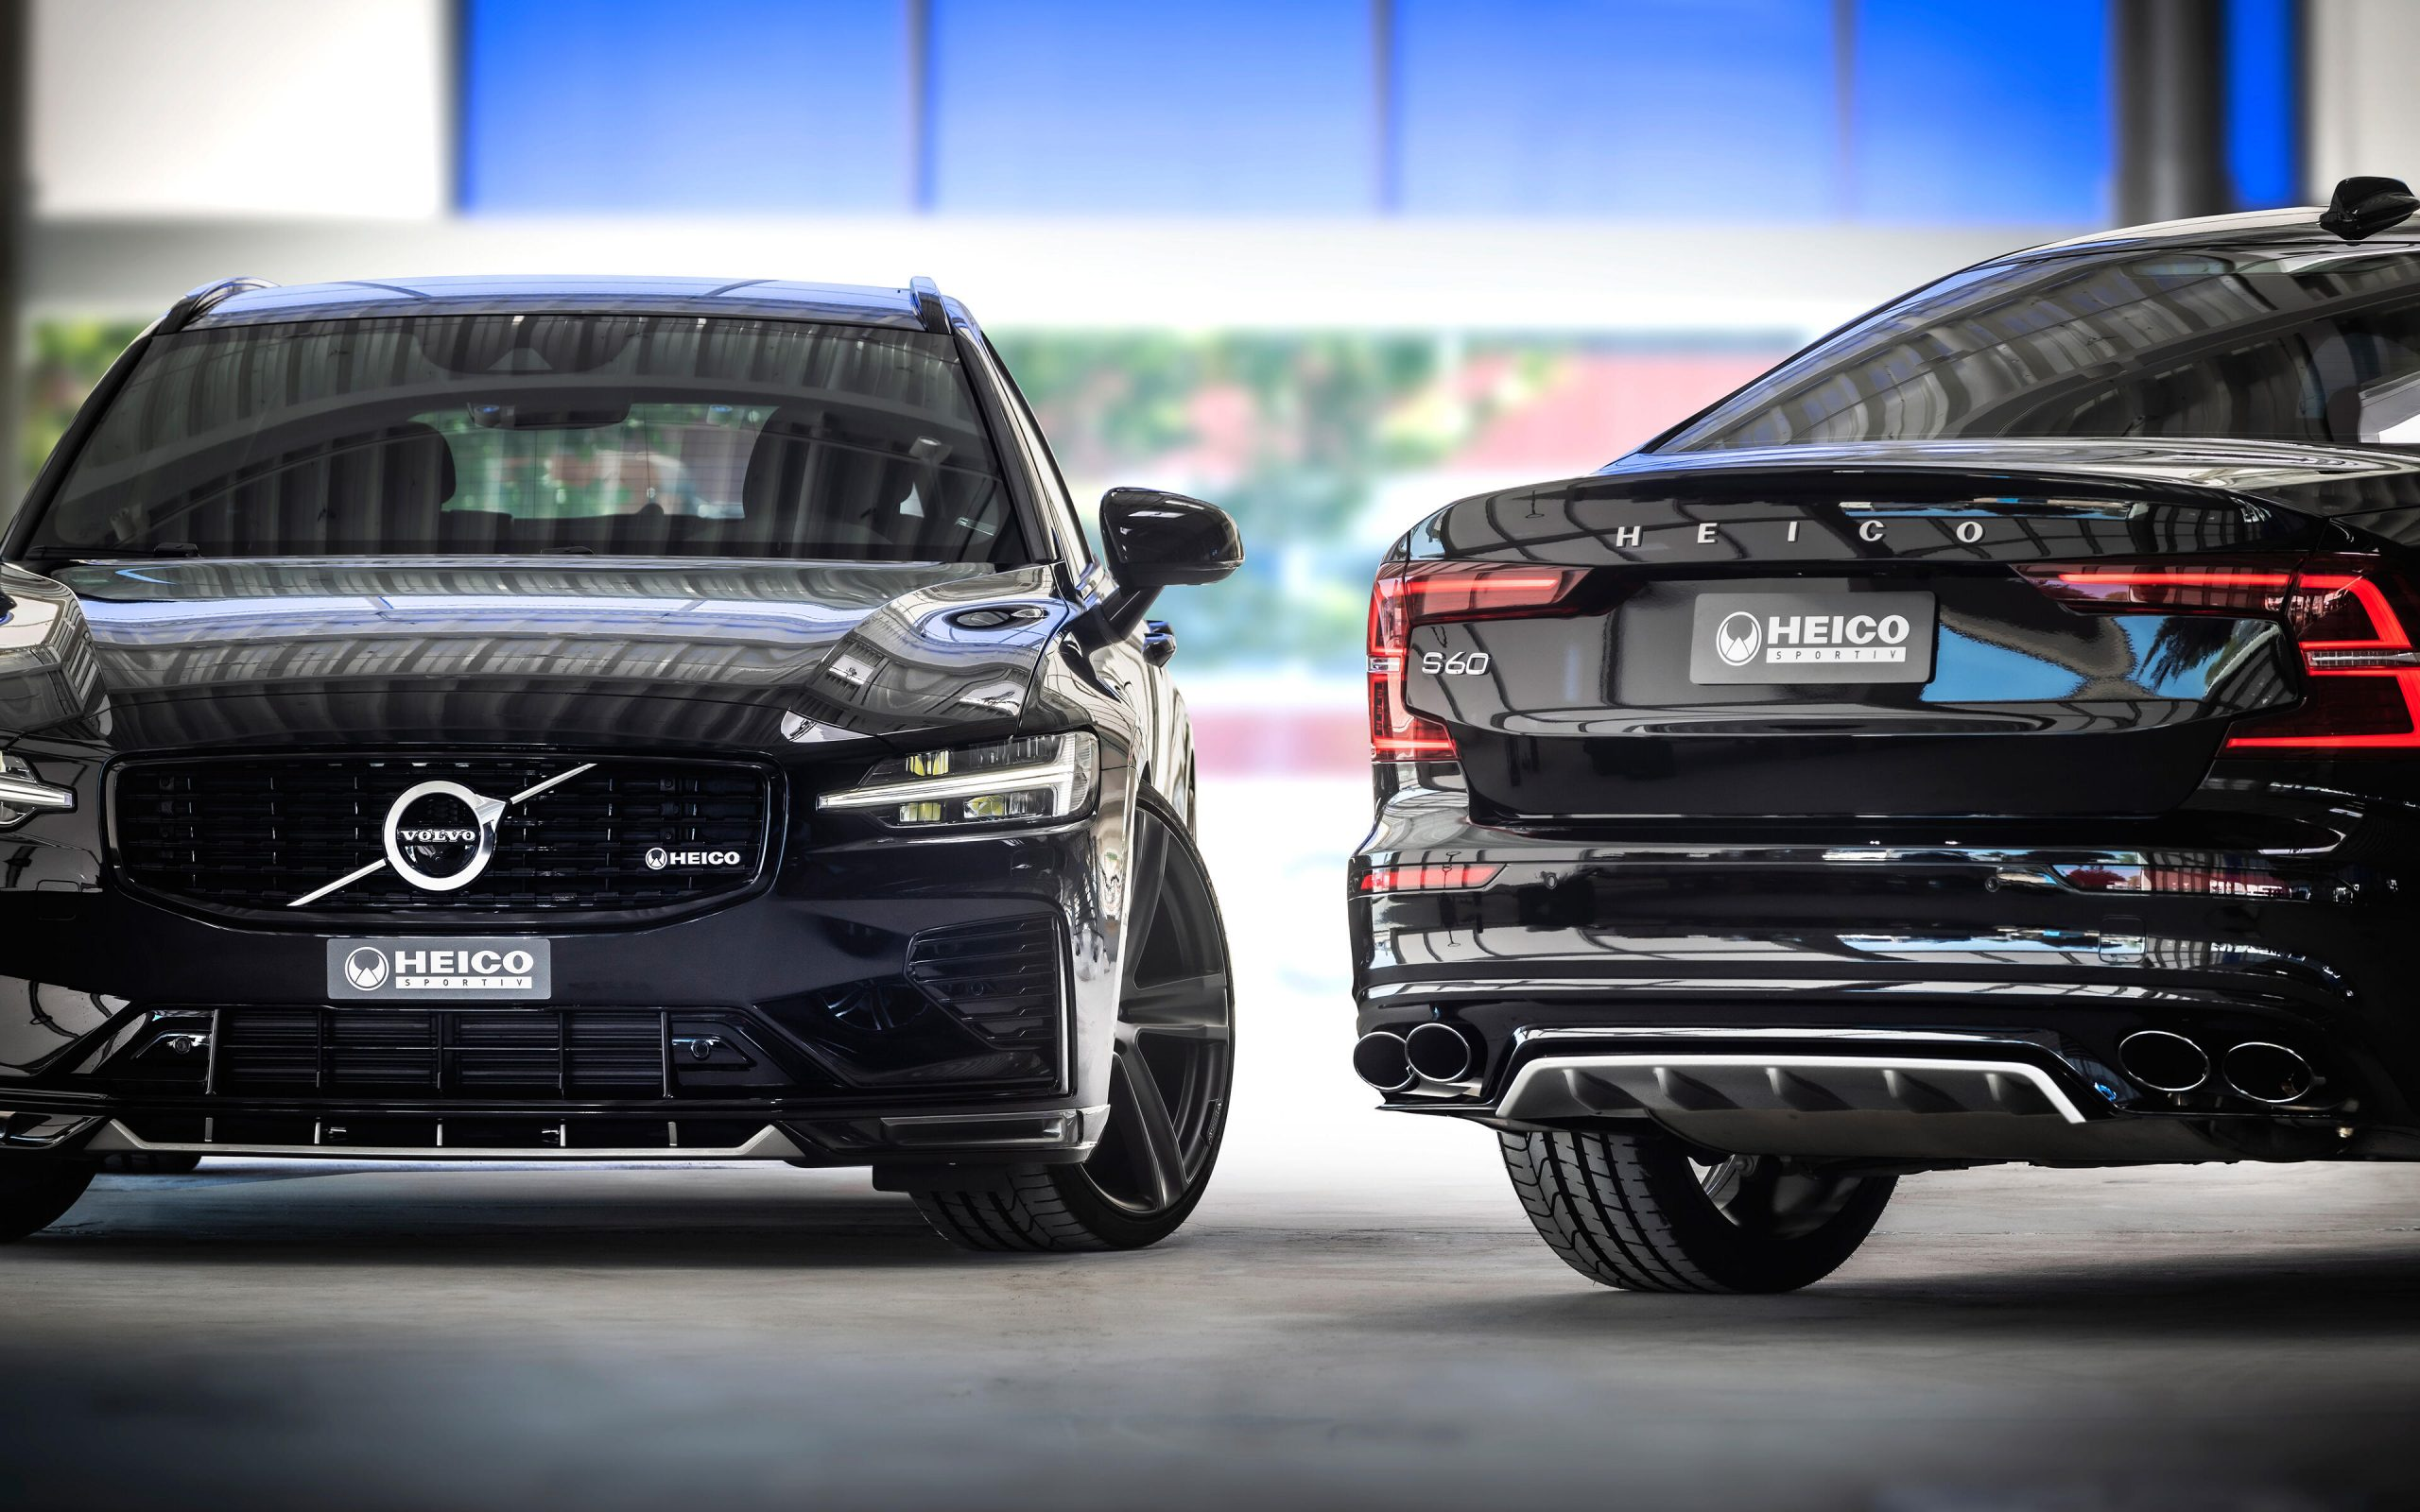 heico-sportiv-s60-224-rear-v60-225-black-front-01